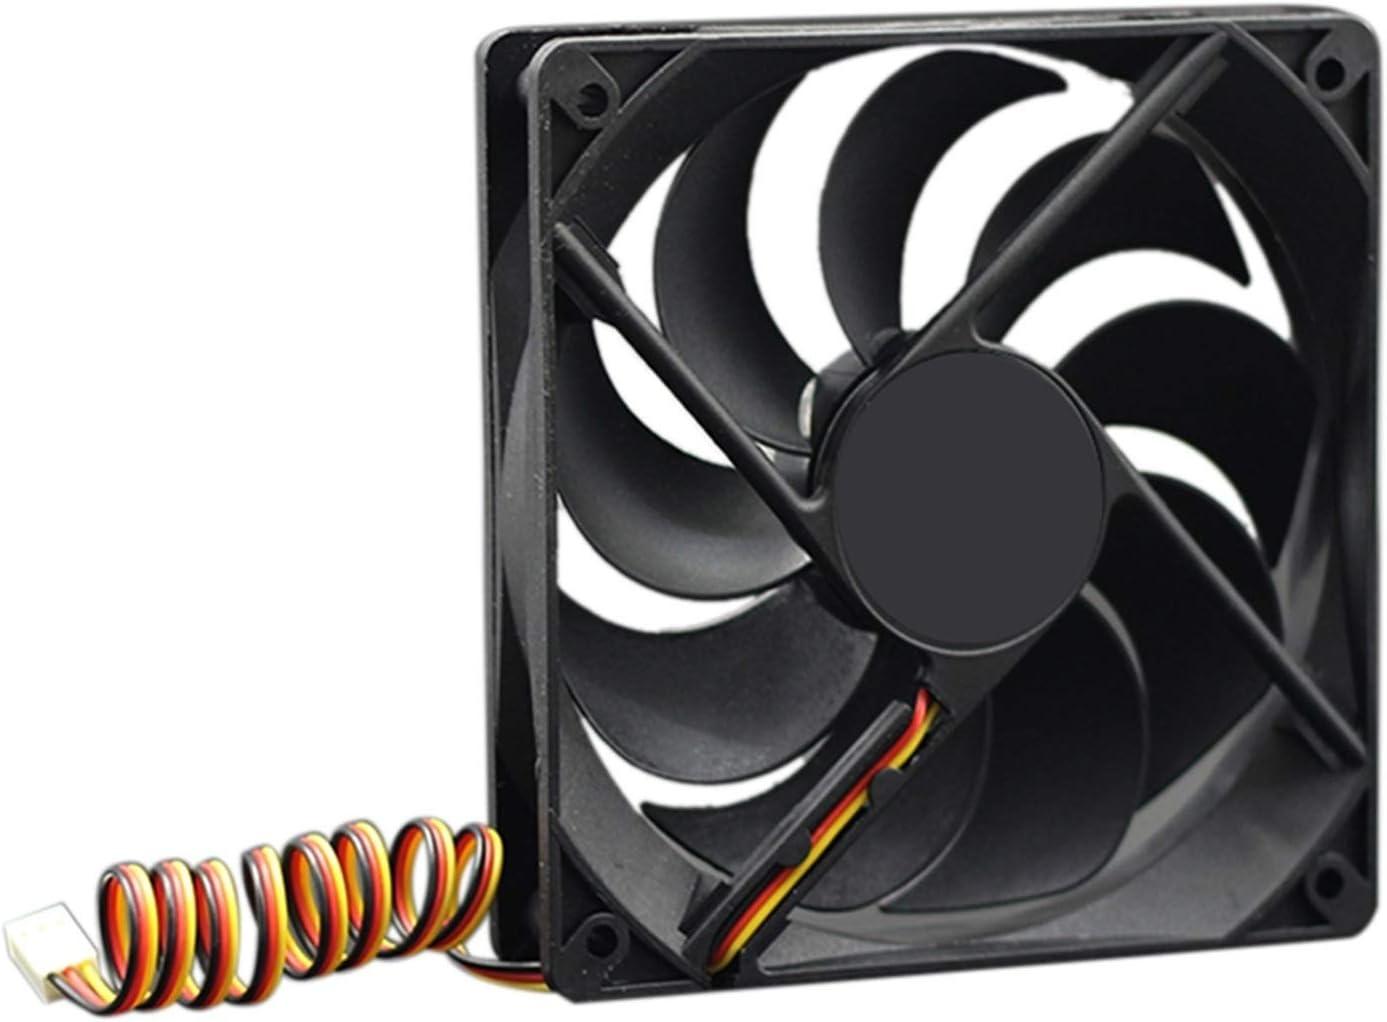 Tranquilo Ventilador De Enfriamiento De 12V para PC 2-Pin 12 Cm Computadora CPU Radiador Radiador Sin Escleos Fan Fácil de Transportar e Instalar (Blade Color : Black)